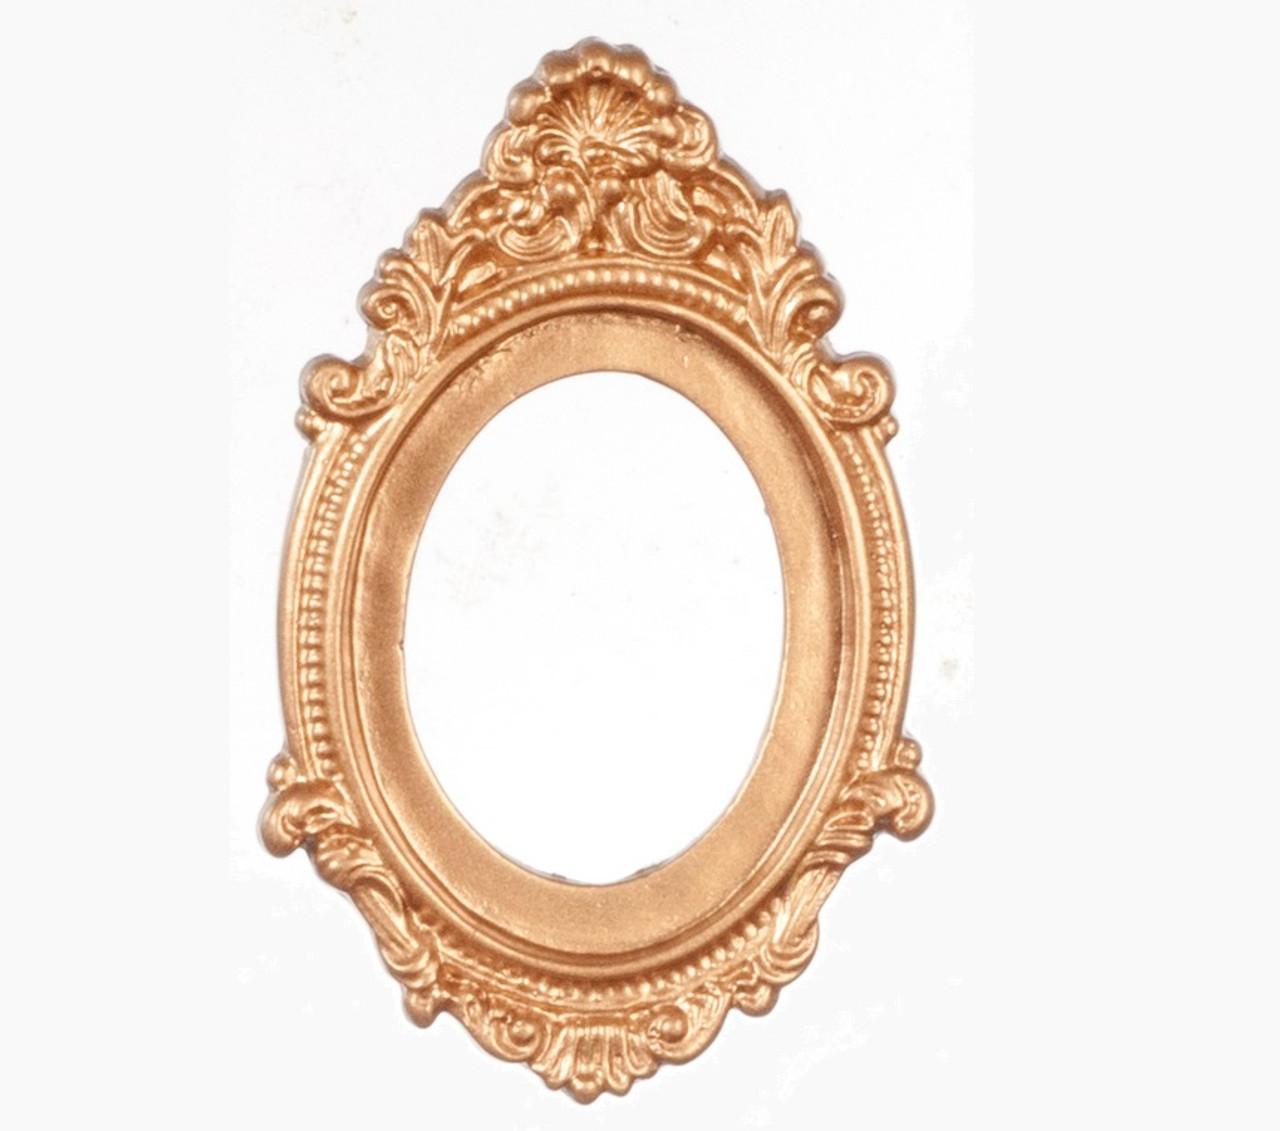 Antique Gold Oval Frame (AZG7087)